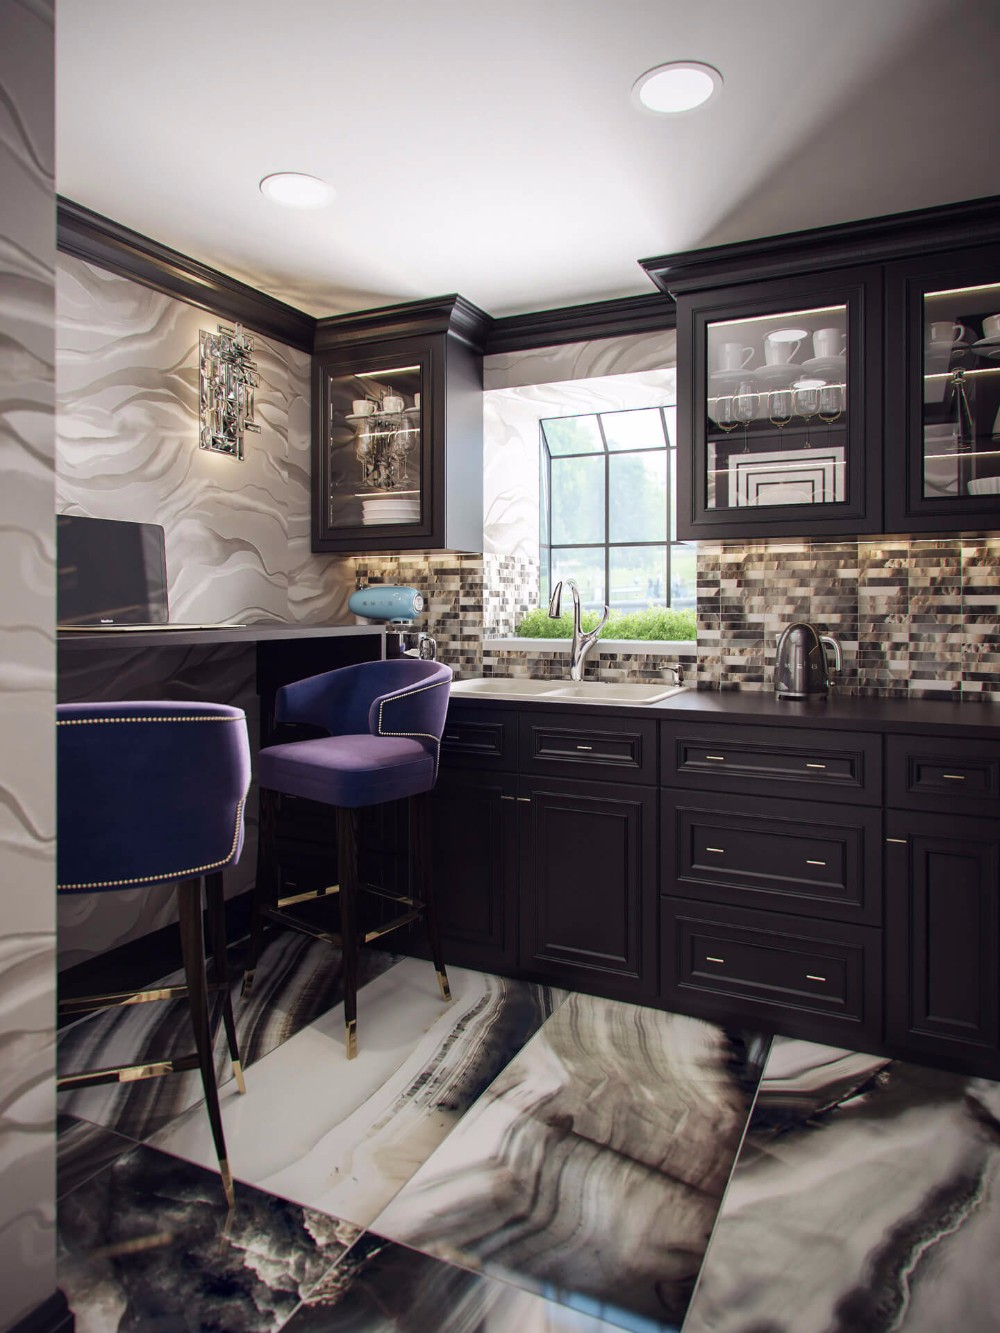 Interior designer victoria kiorsak 39 s most stylish decor secrets for Richmond interior design firms